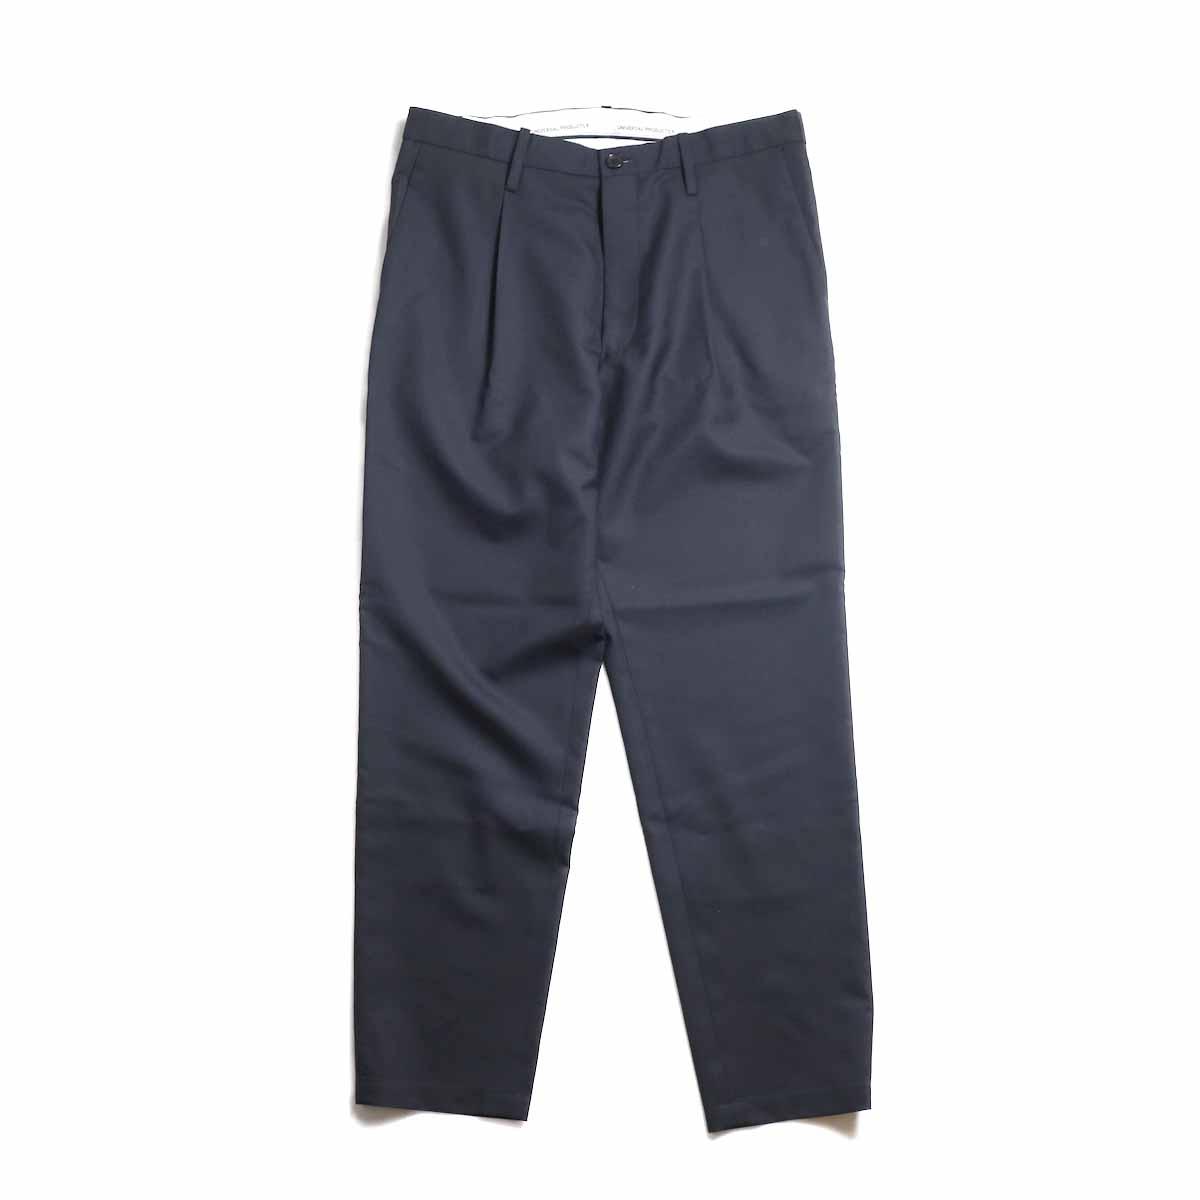 UNIVERSAL PRODUCTS / Wool Easy Slacks -Navy